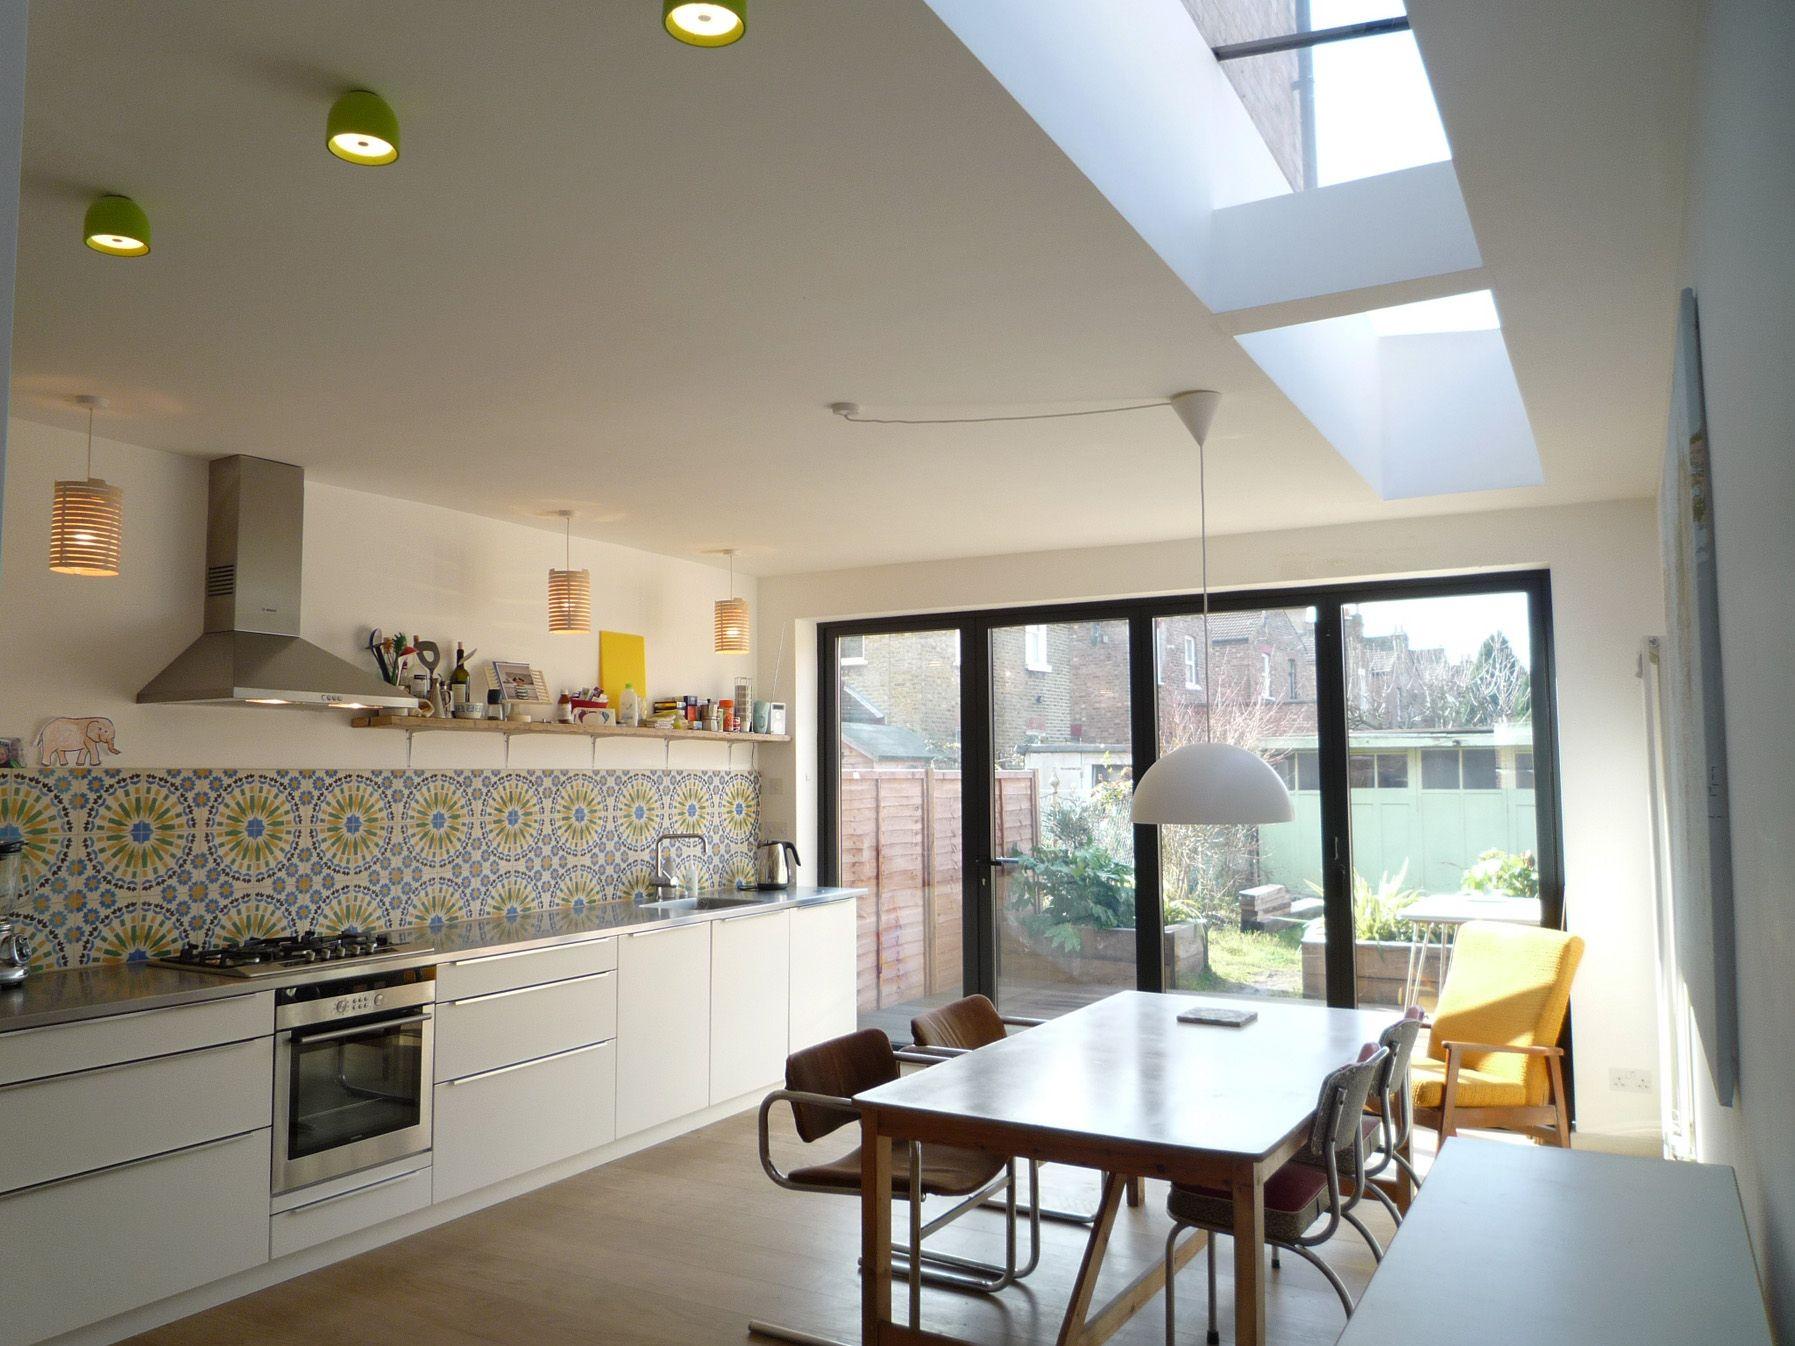 kitchen home decor ideas pinterest. Black Bedroom Furniture Sets. Home Design Ideas